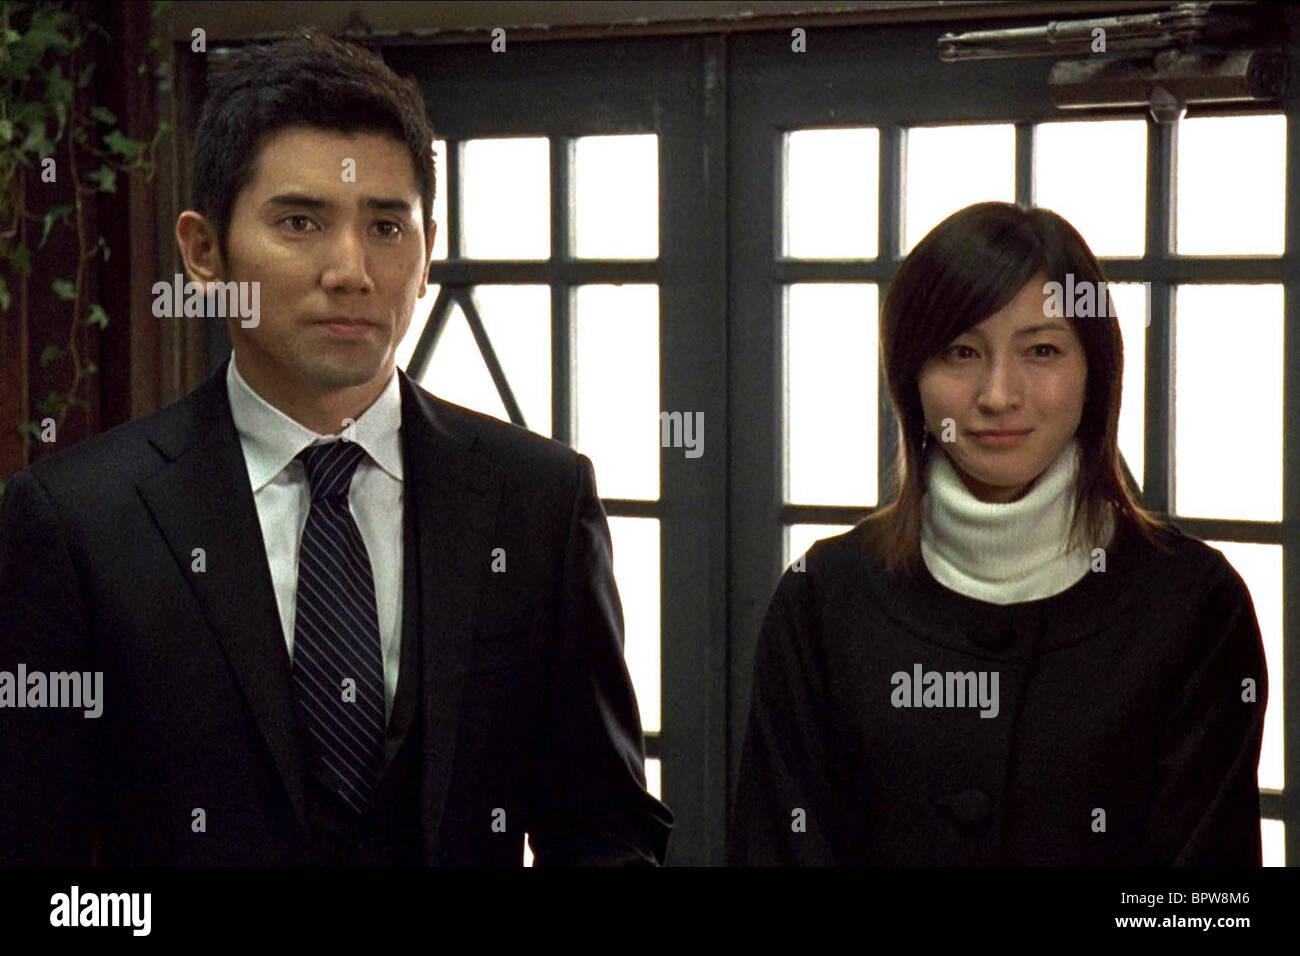 MASAHIRO MOTOKI & RYOKO HIROSUE OKURIBITO; DEPARTURES (2008) - Stock Image